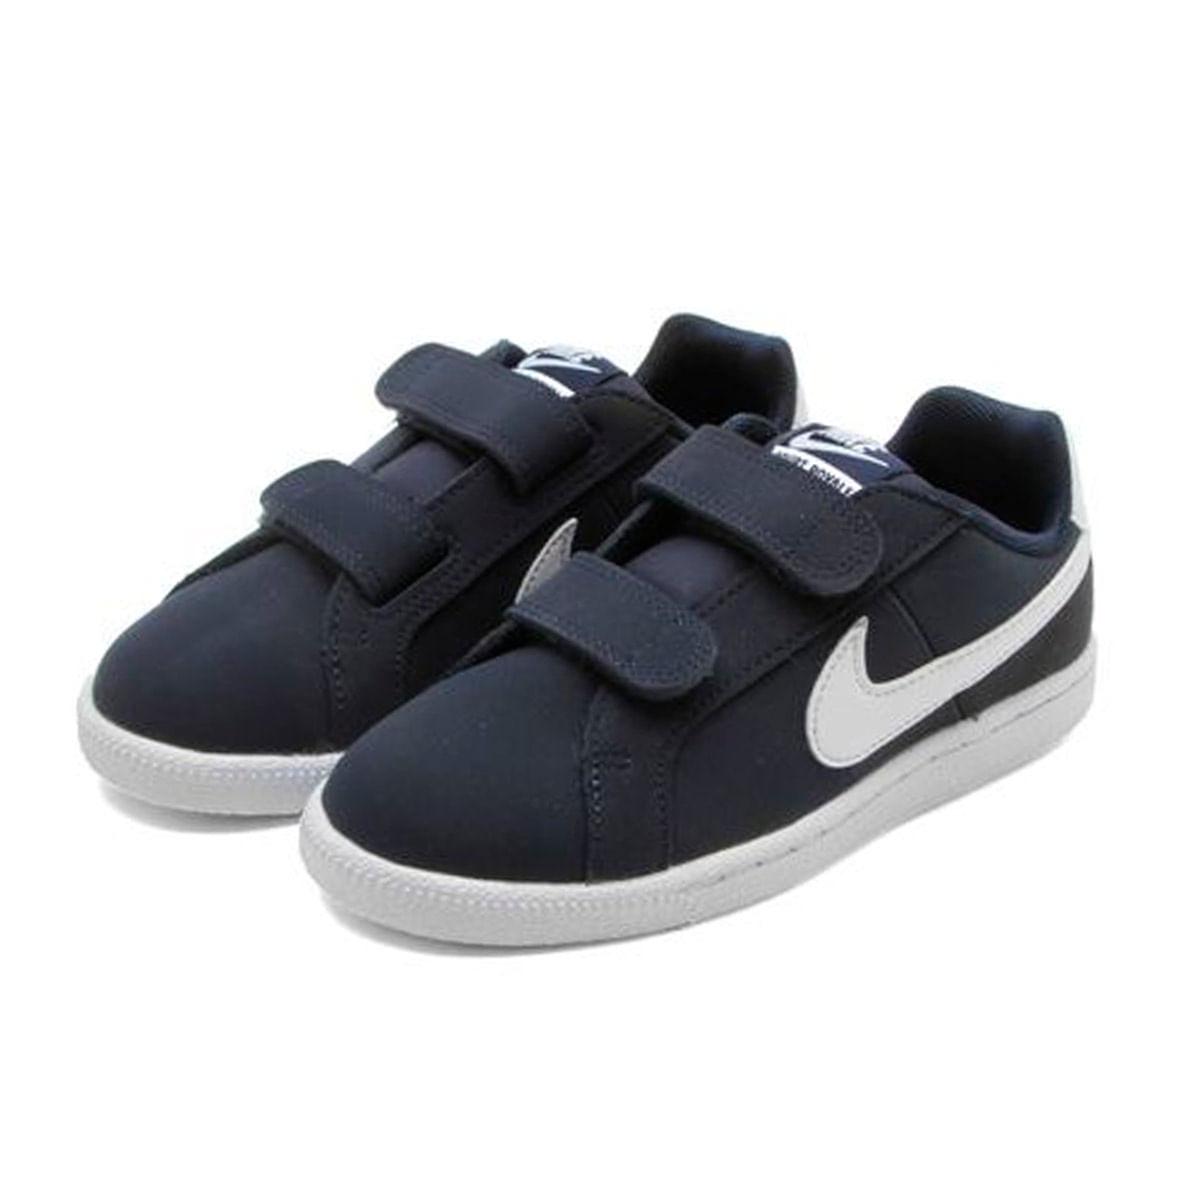 Tenis-Infantil-Nike-Court-Royale--27-ao-33--